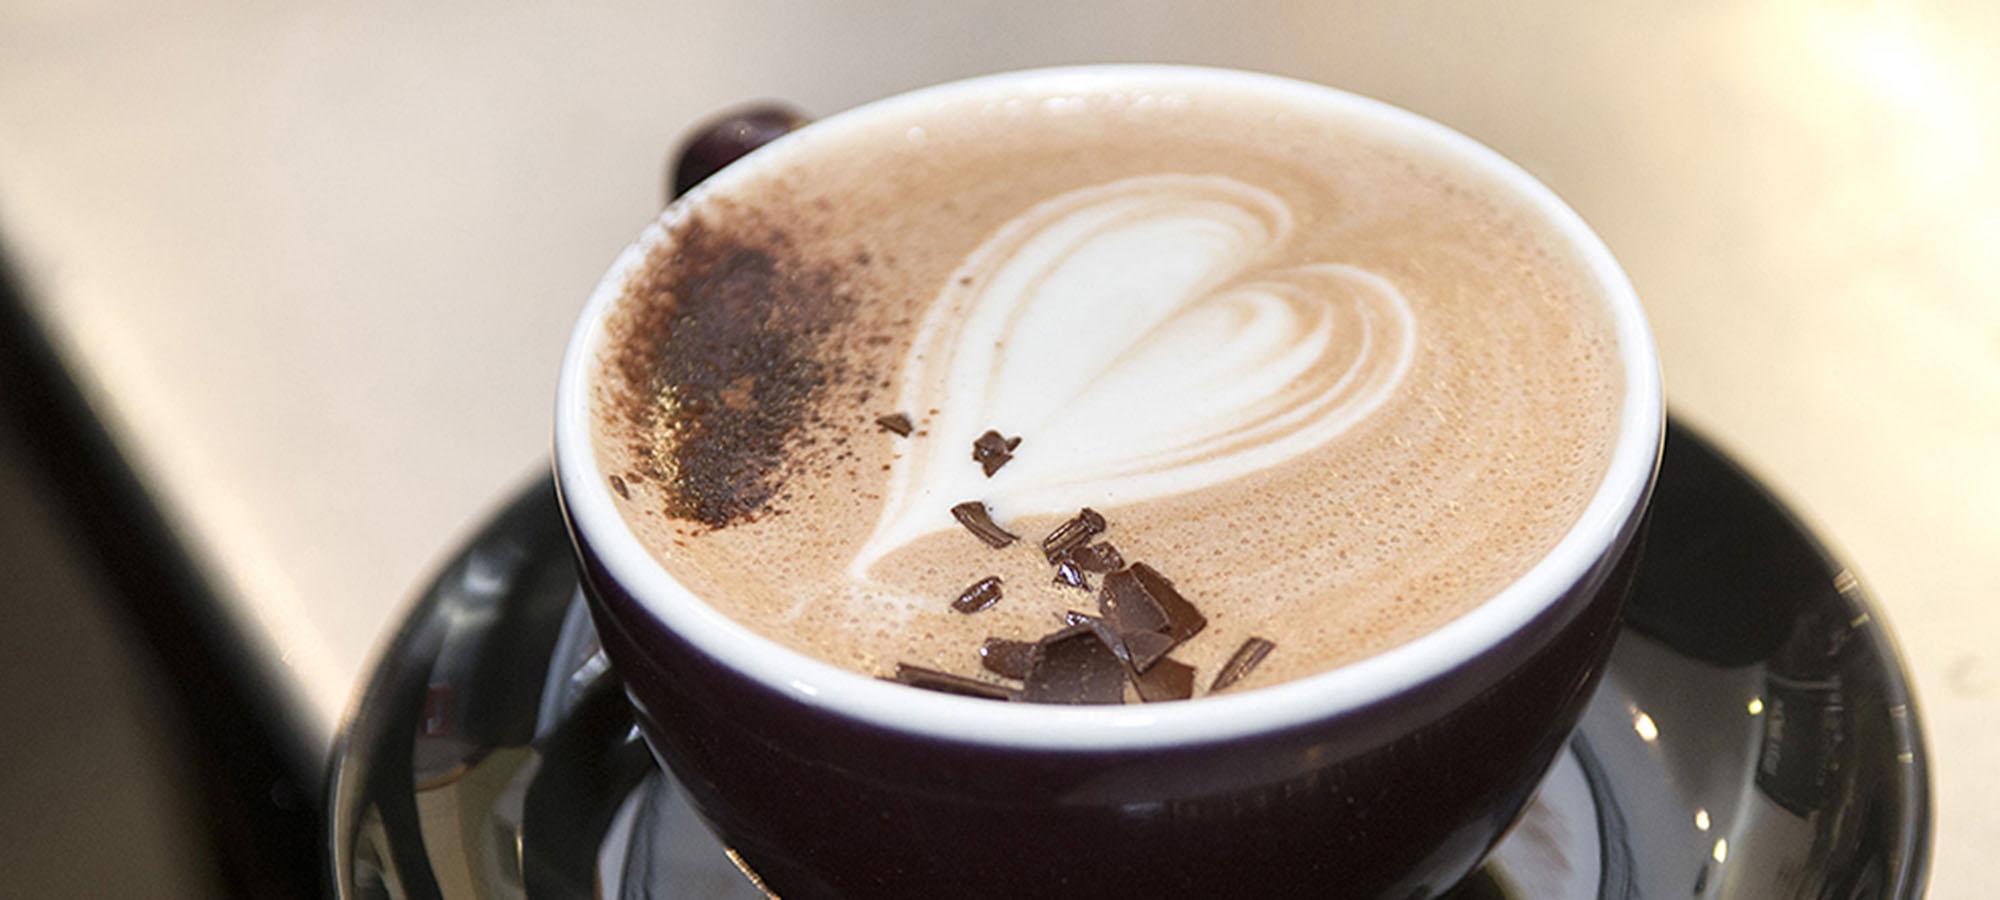 barista coffee latte art heart